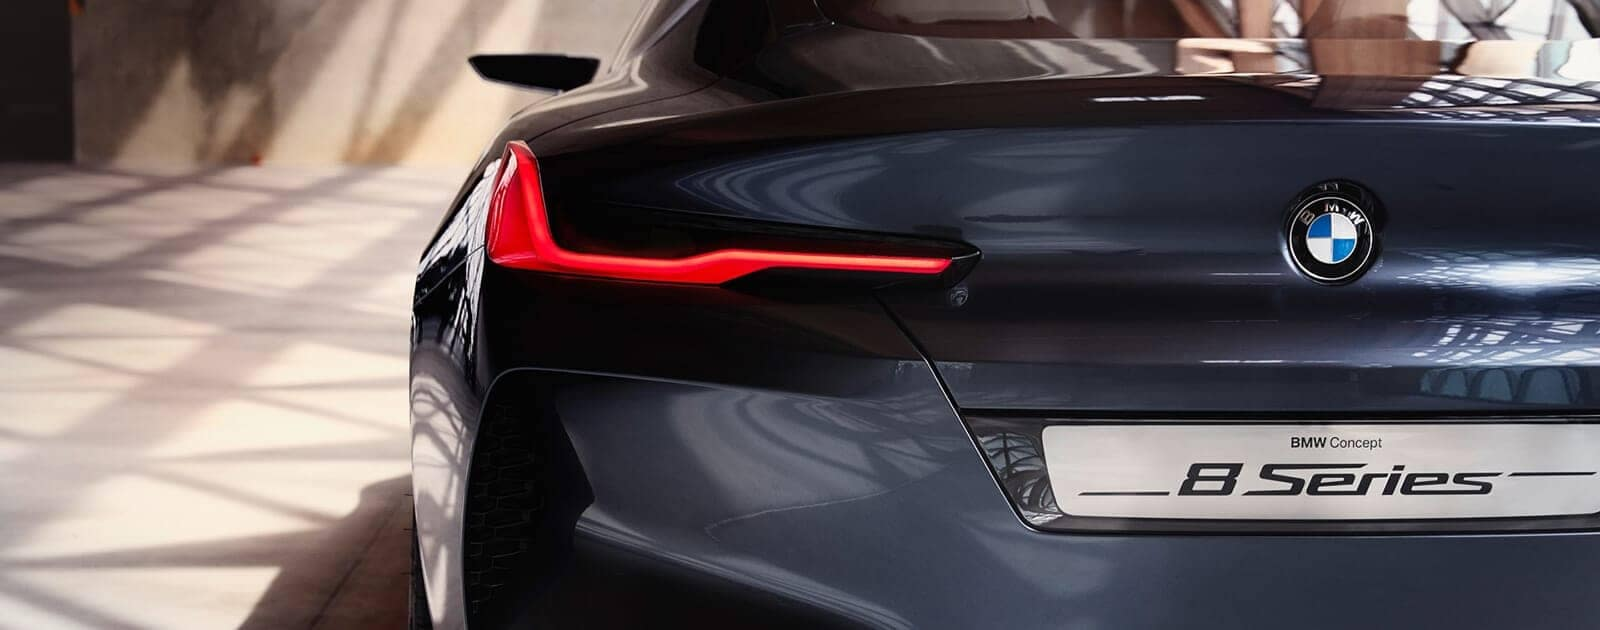 BMW_8Series 5